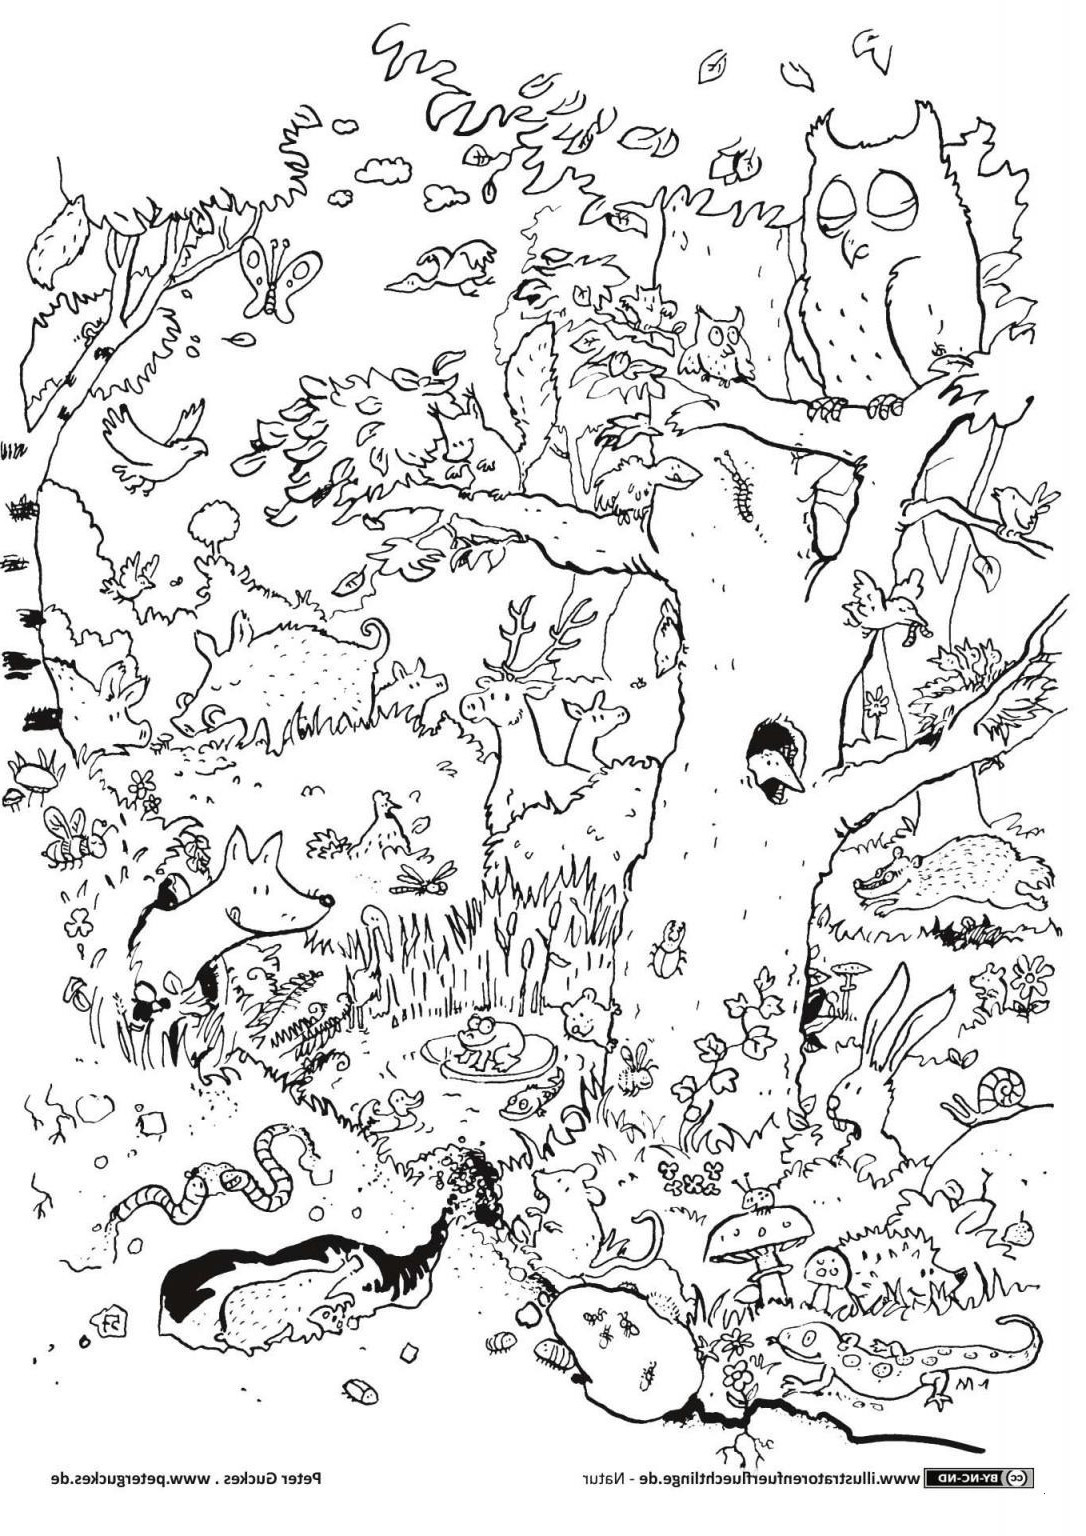 Ninjago Ausmalbilder Jay Genial 36 Luxus Ausmalbilder Ninjago Kostenlos – Große Coloring Page Sammlung Bild